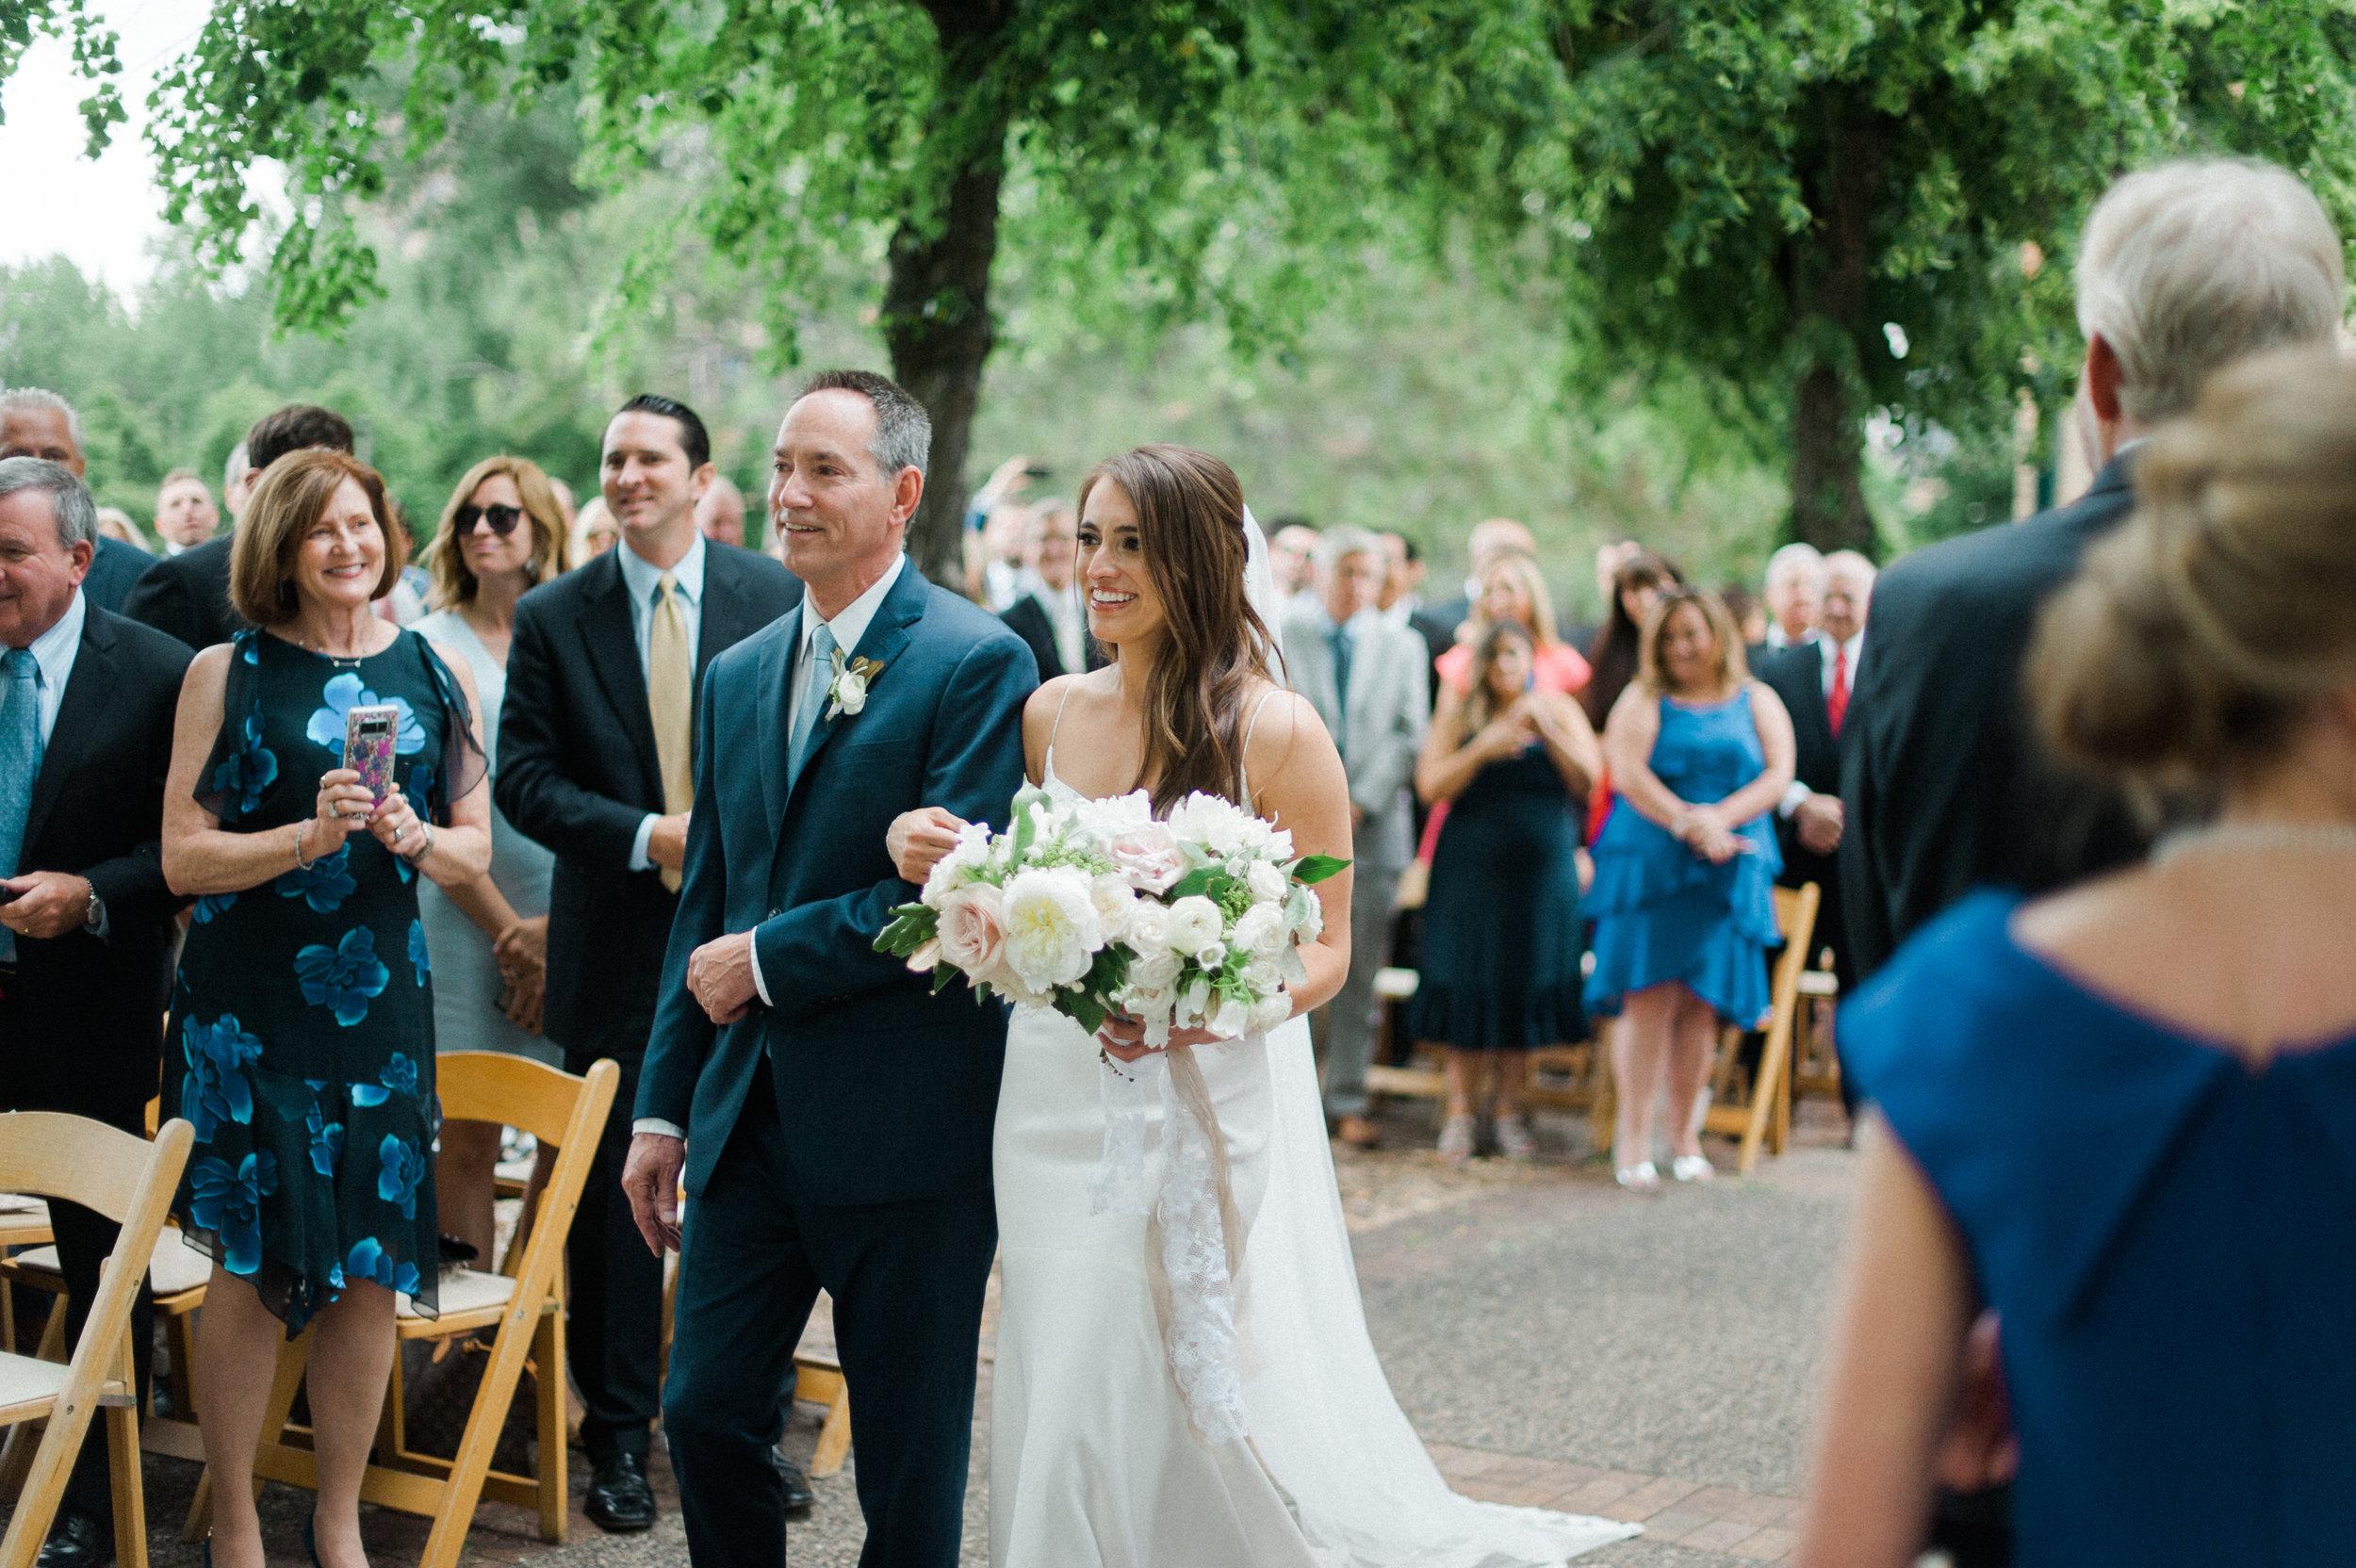 Wedding-Ceremony-Nicollet-Island-Pavilion-Minneapolis-MN.jpg